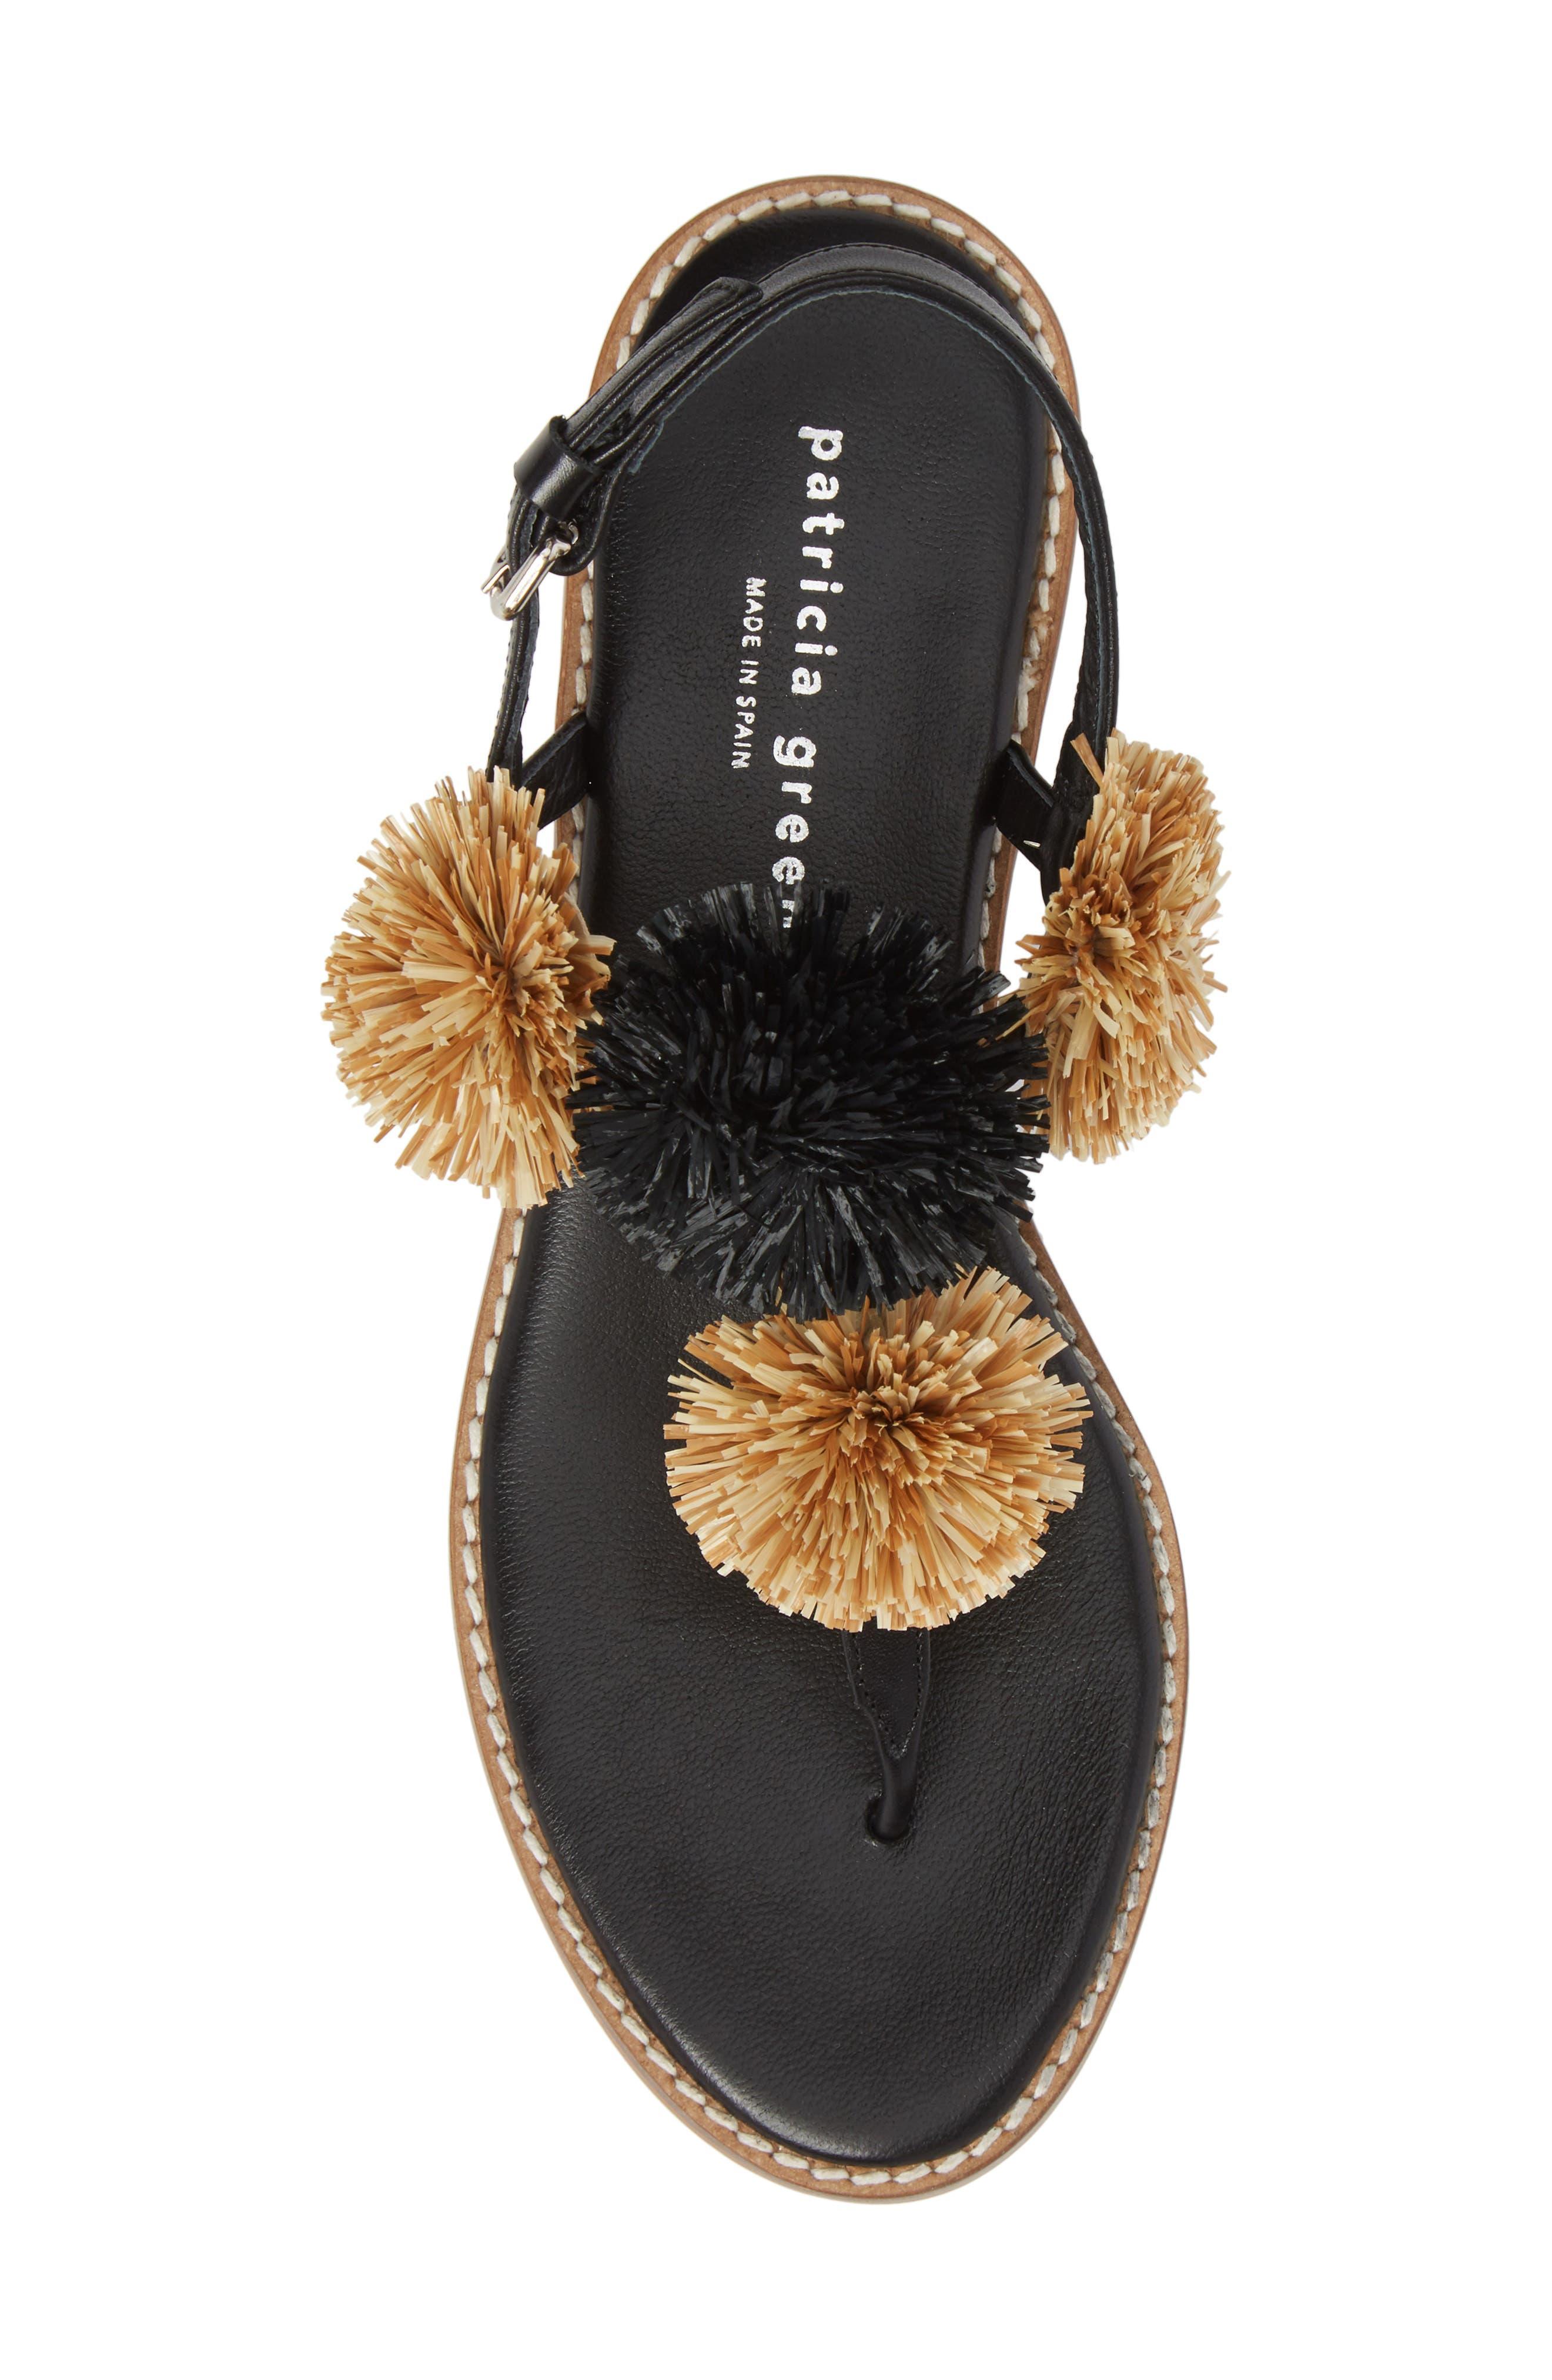 Pompom Thong Sandal,                             Alternate thumbnail 5, color,                             Black Leather